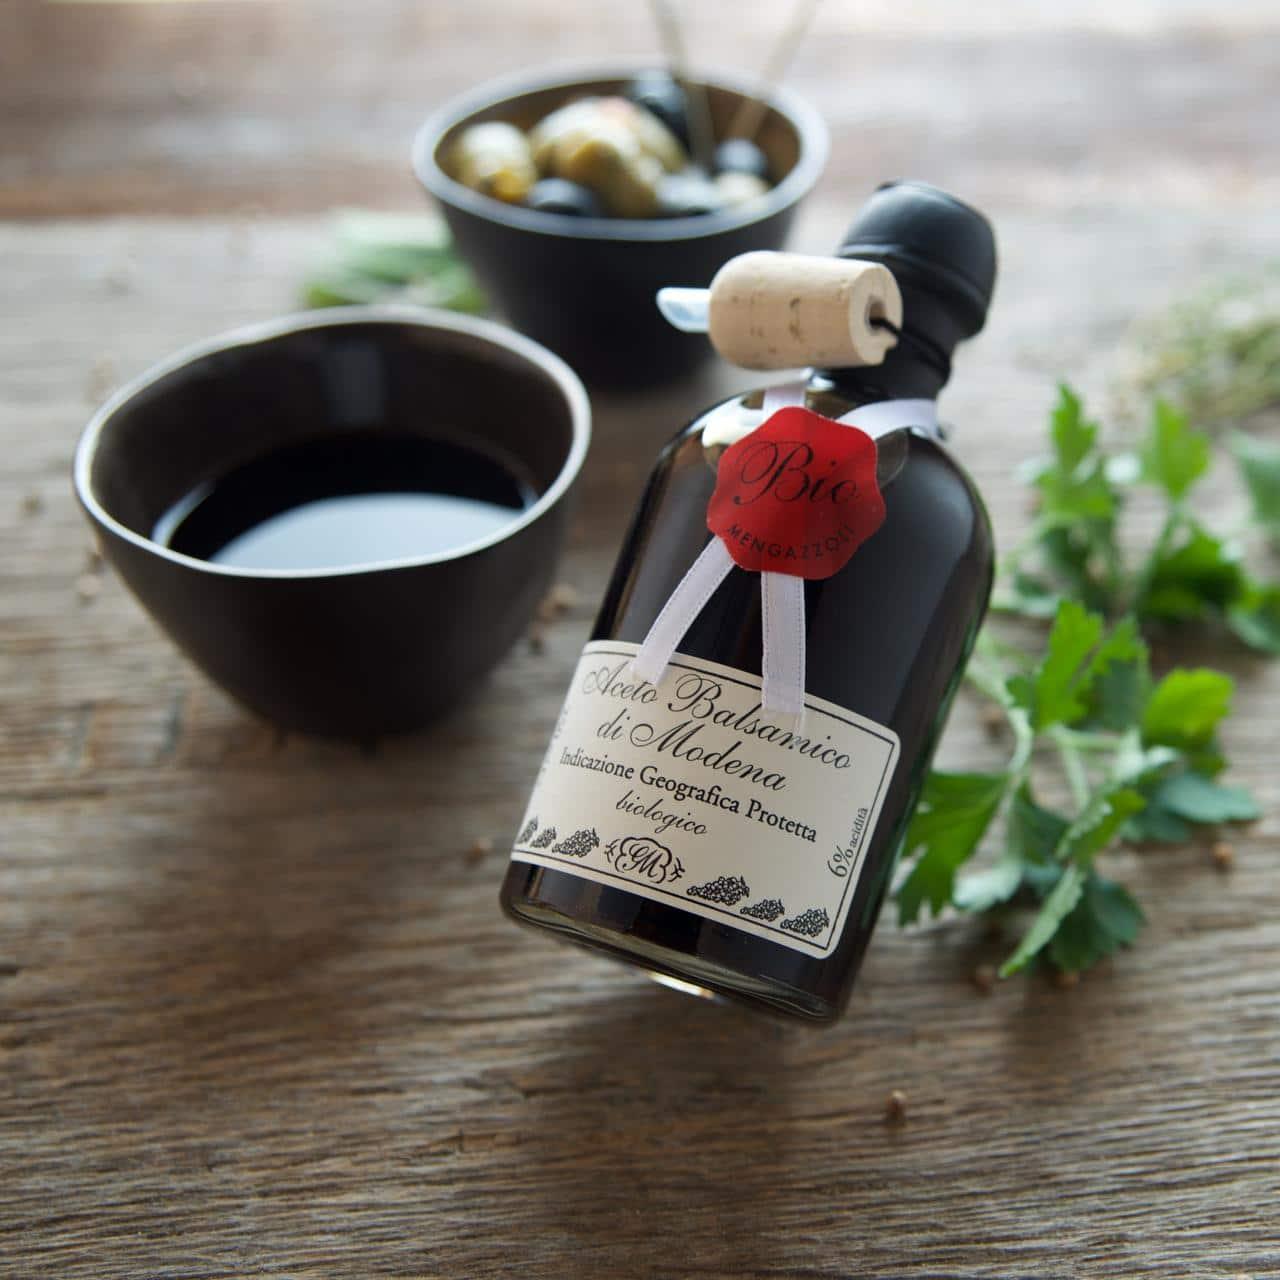 Aceto Balsamico BIO olijfolie